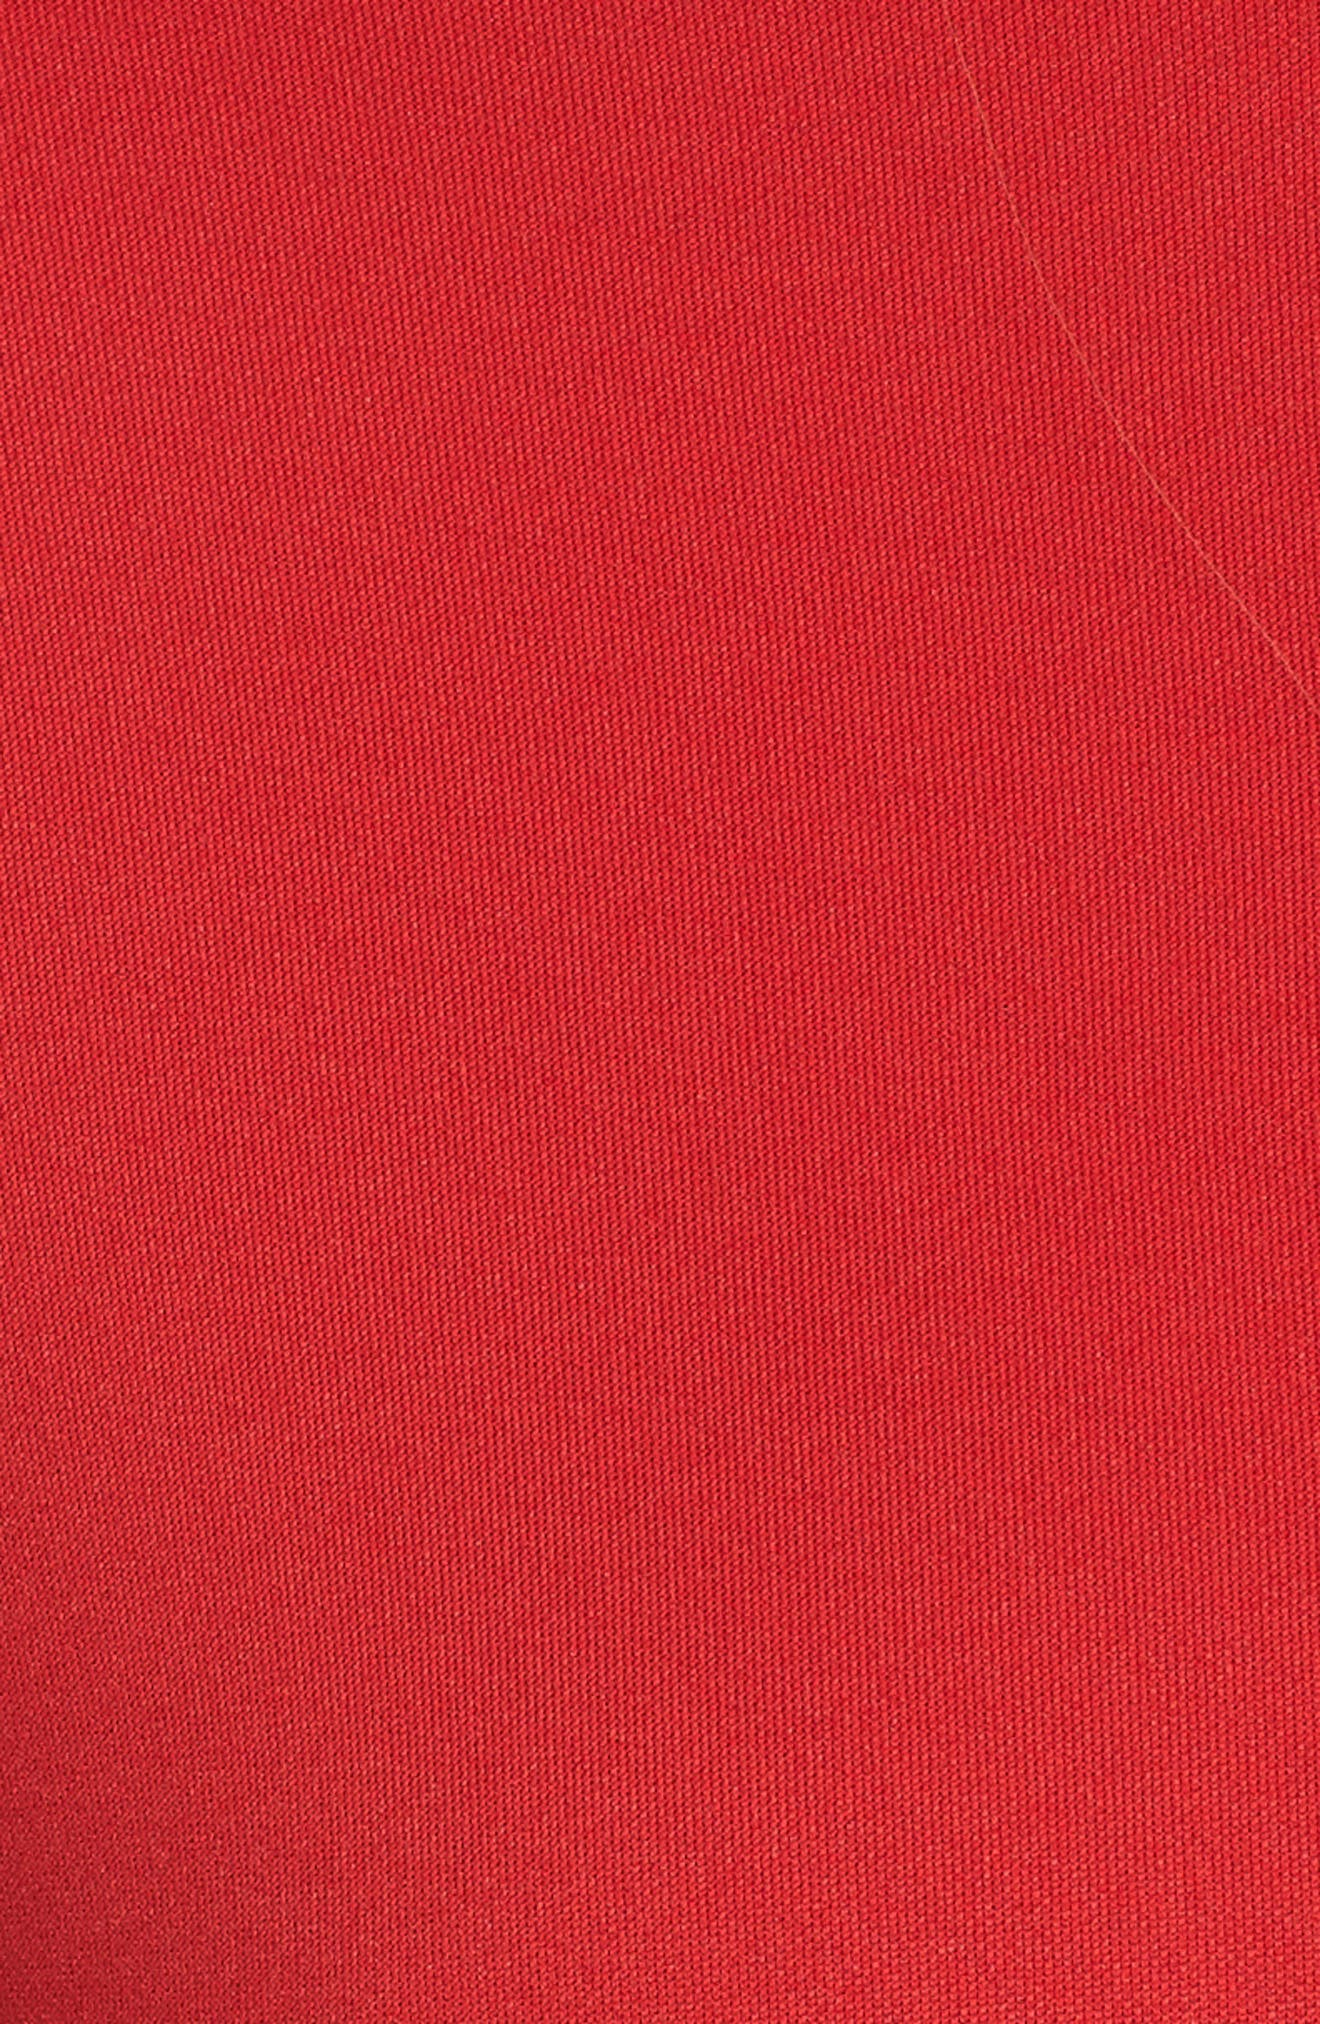 Banda Crop Jacket,                             Alternate thumbnail 11, color,